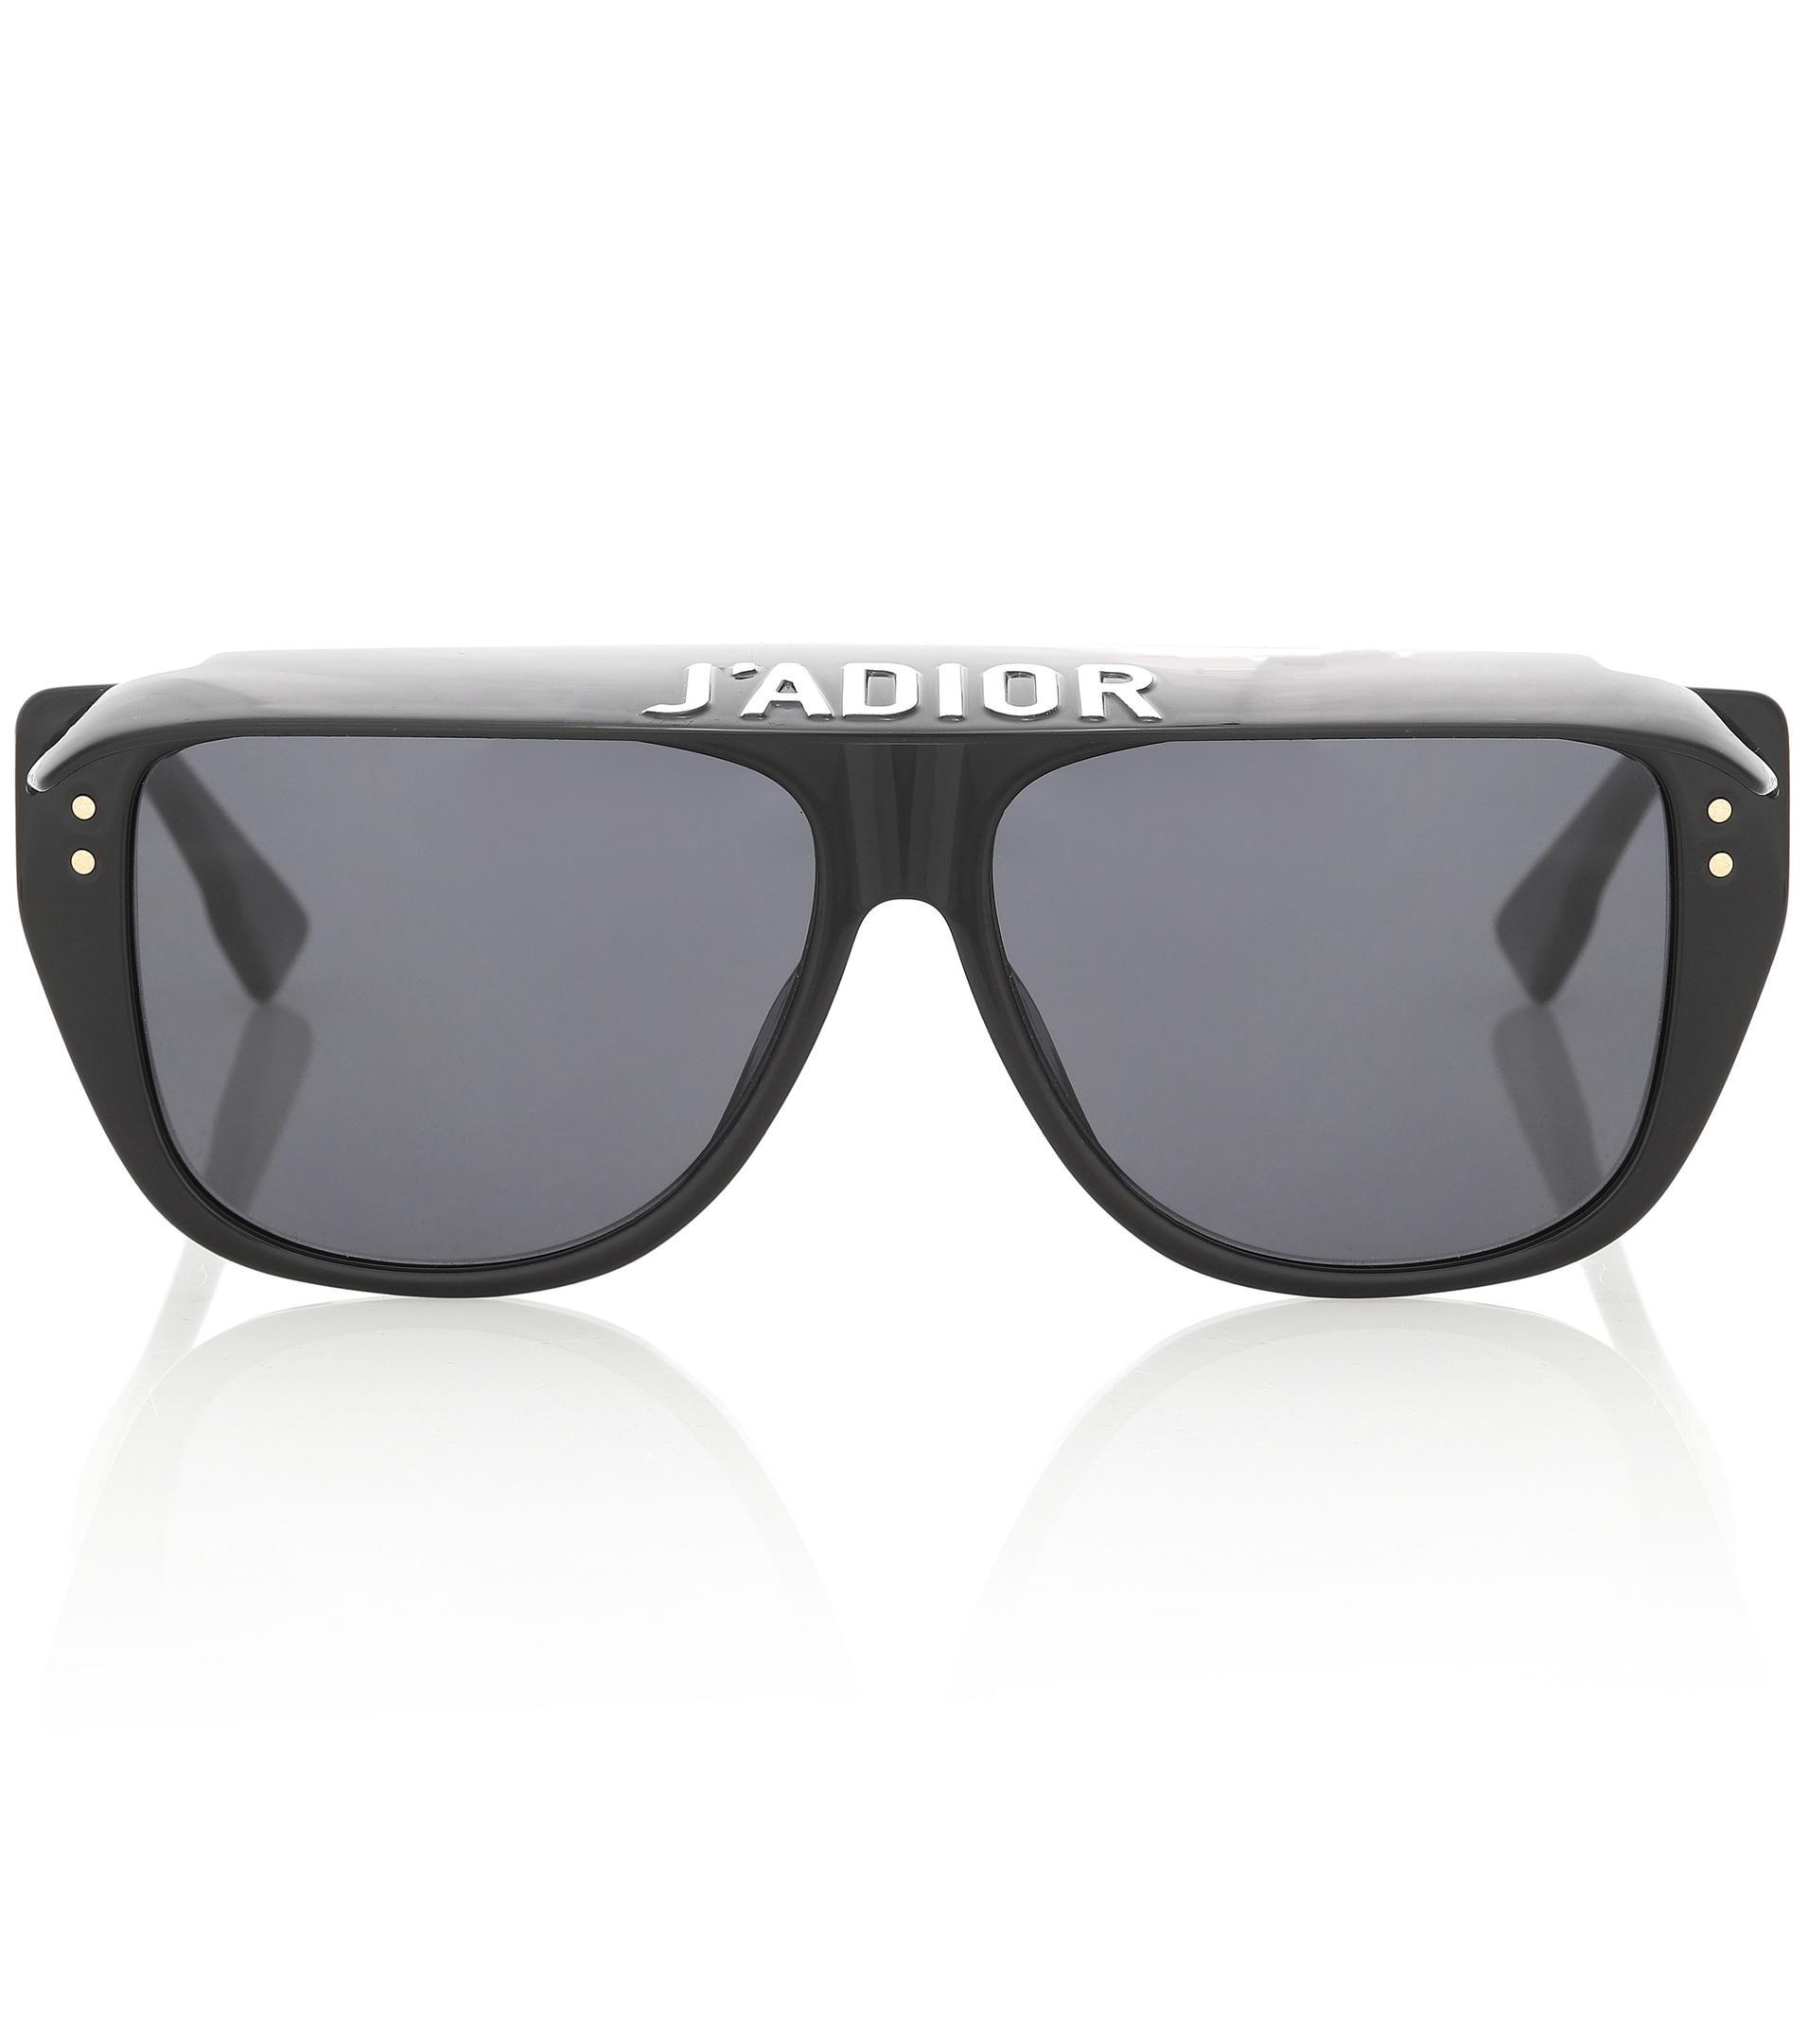 bd266cd942 Dior - Black J adior Visor Sunglasses - Lyst. View fullscreen